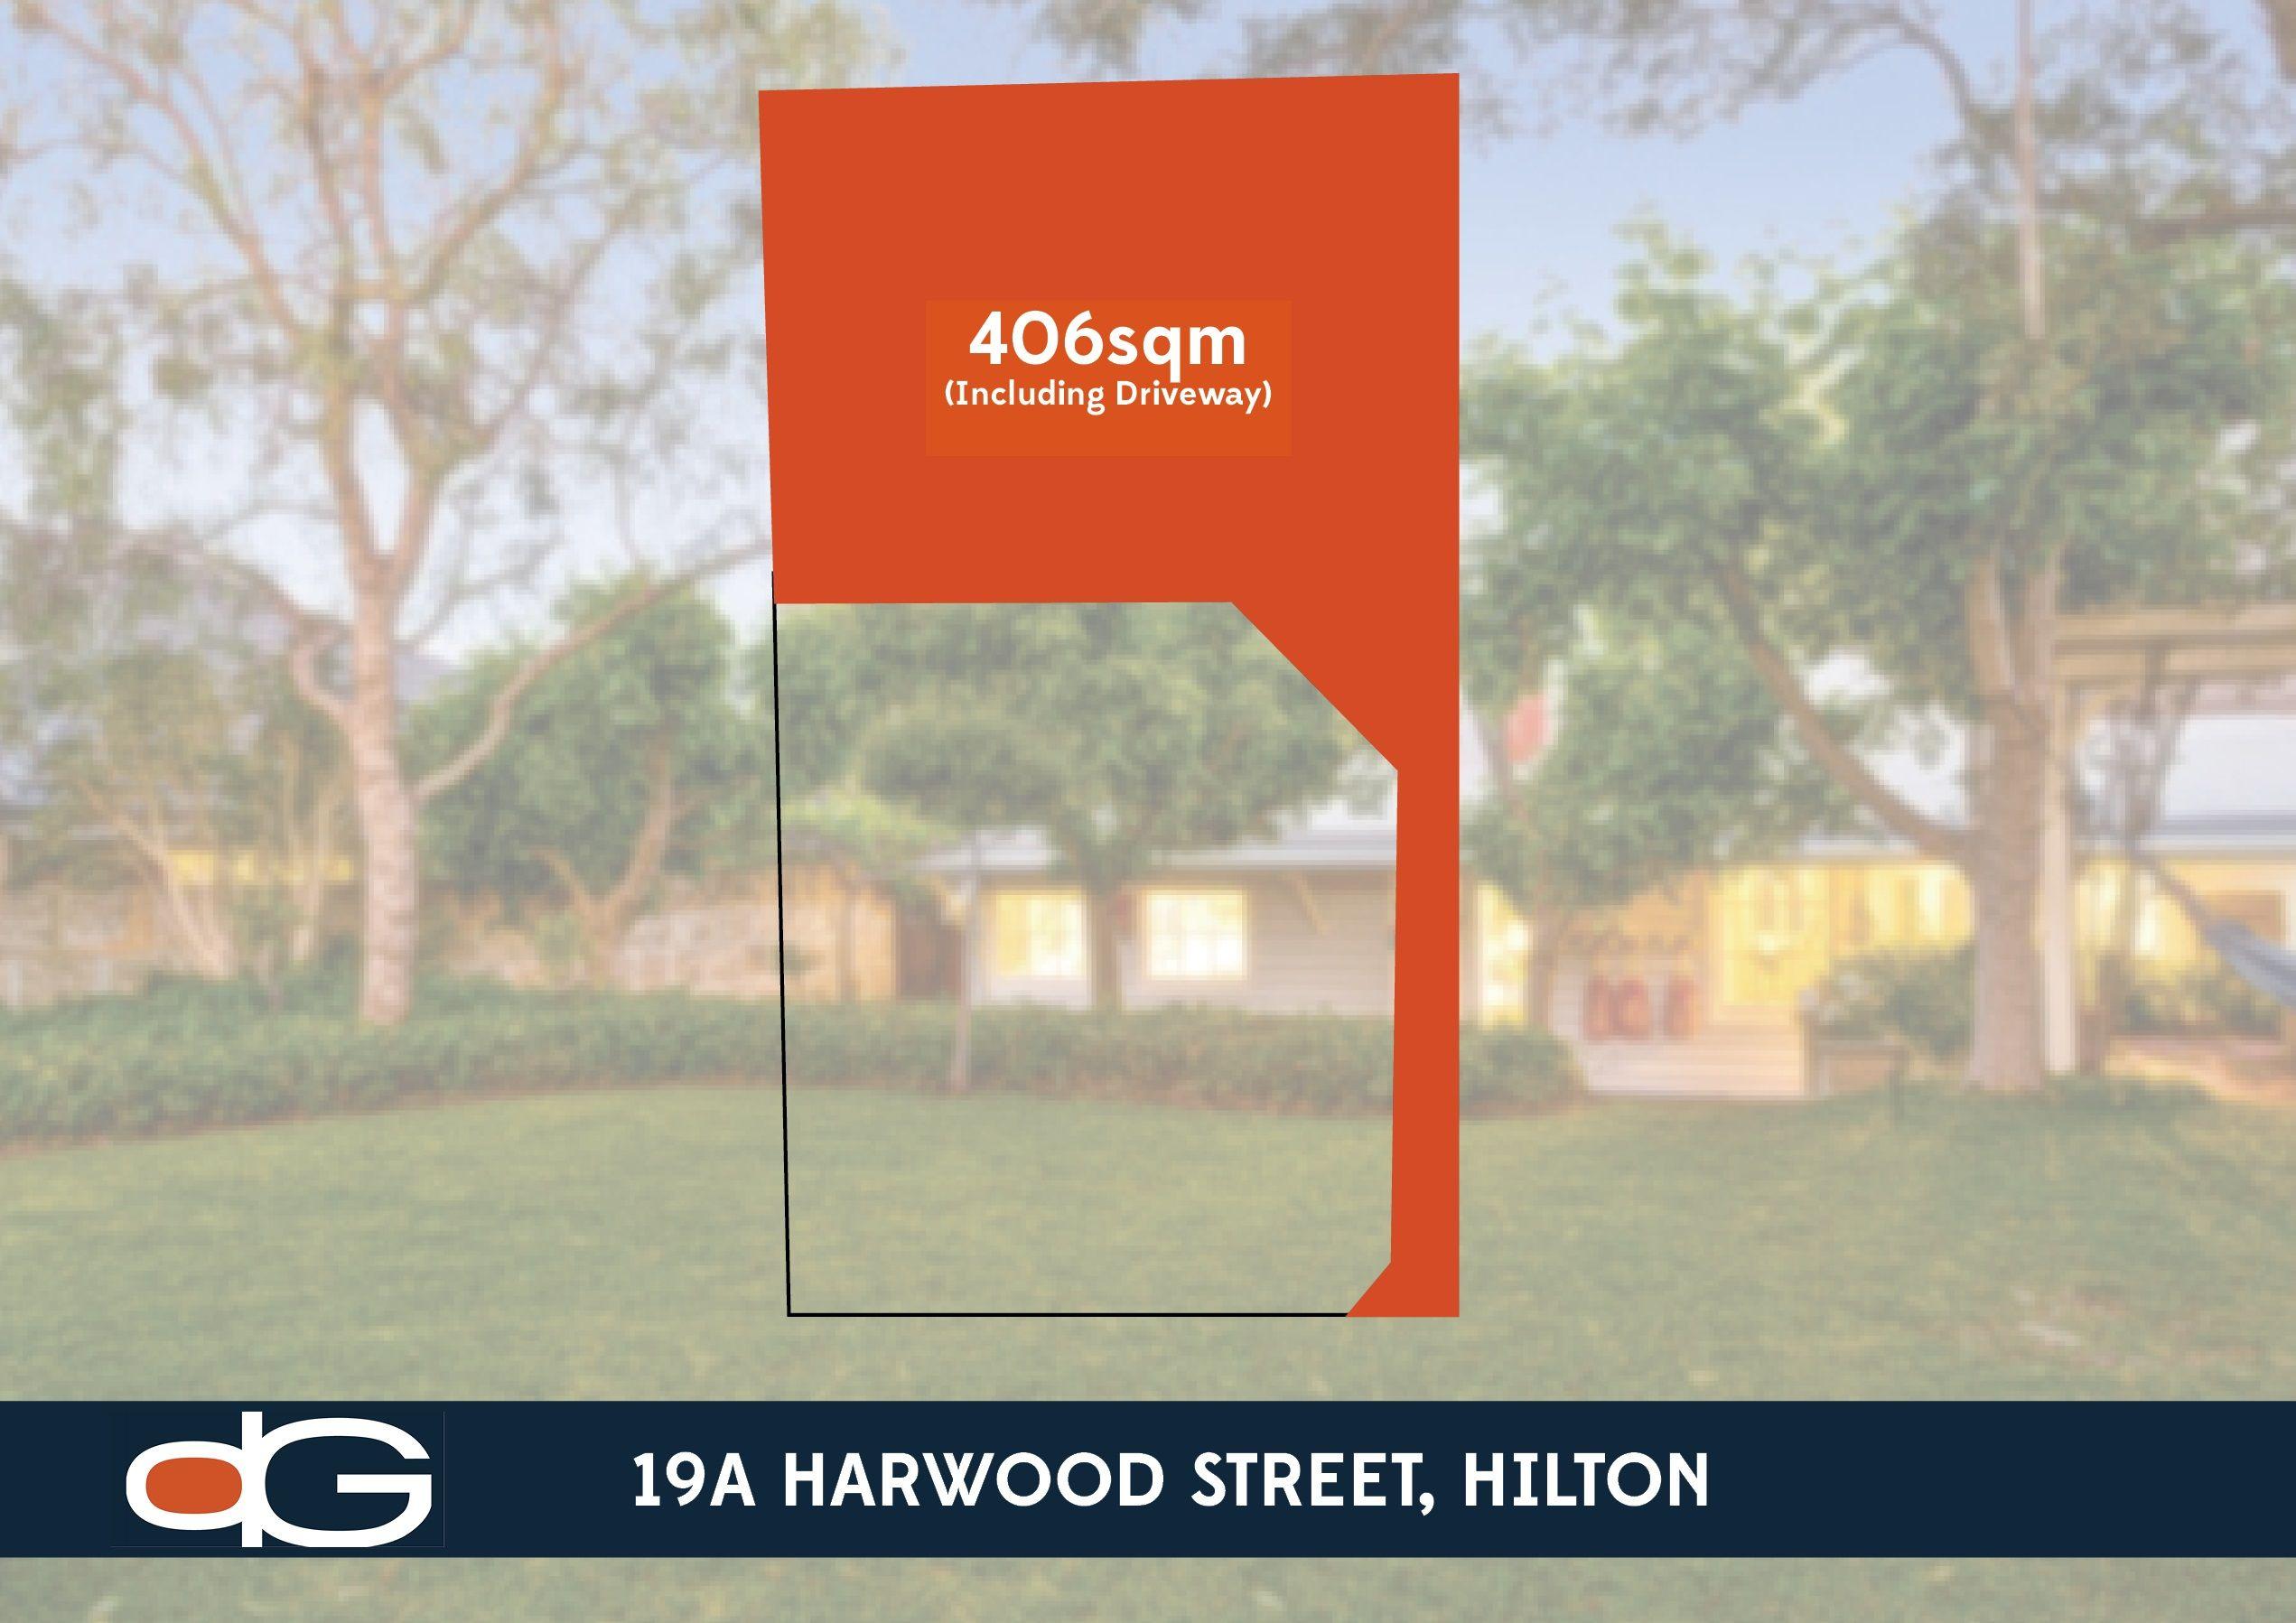 19A Harwood Street, Hilton